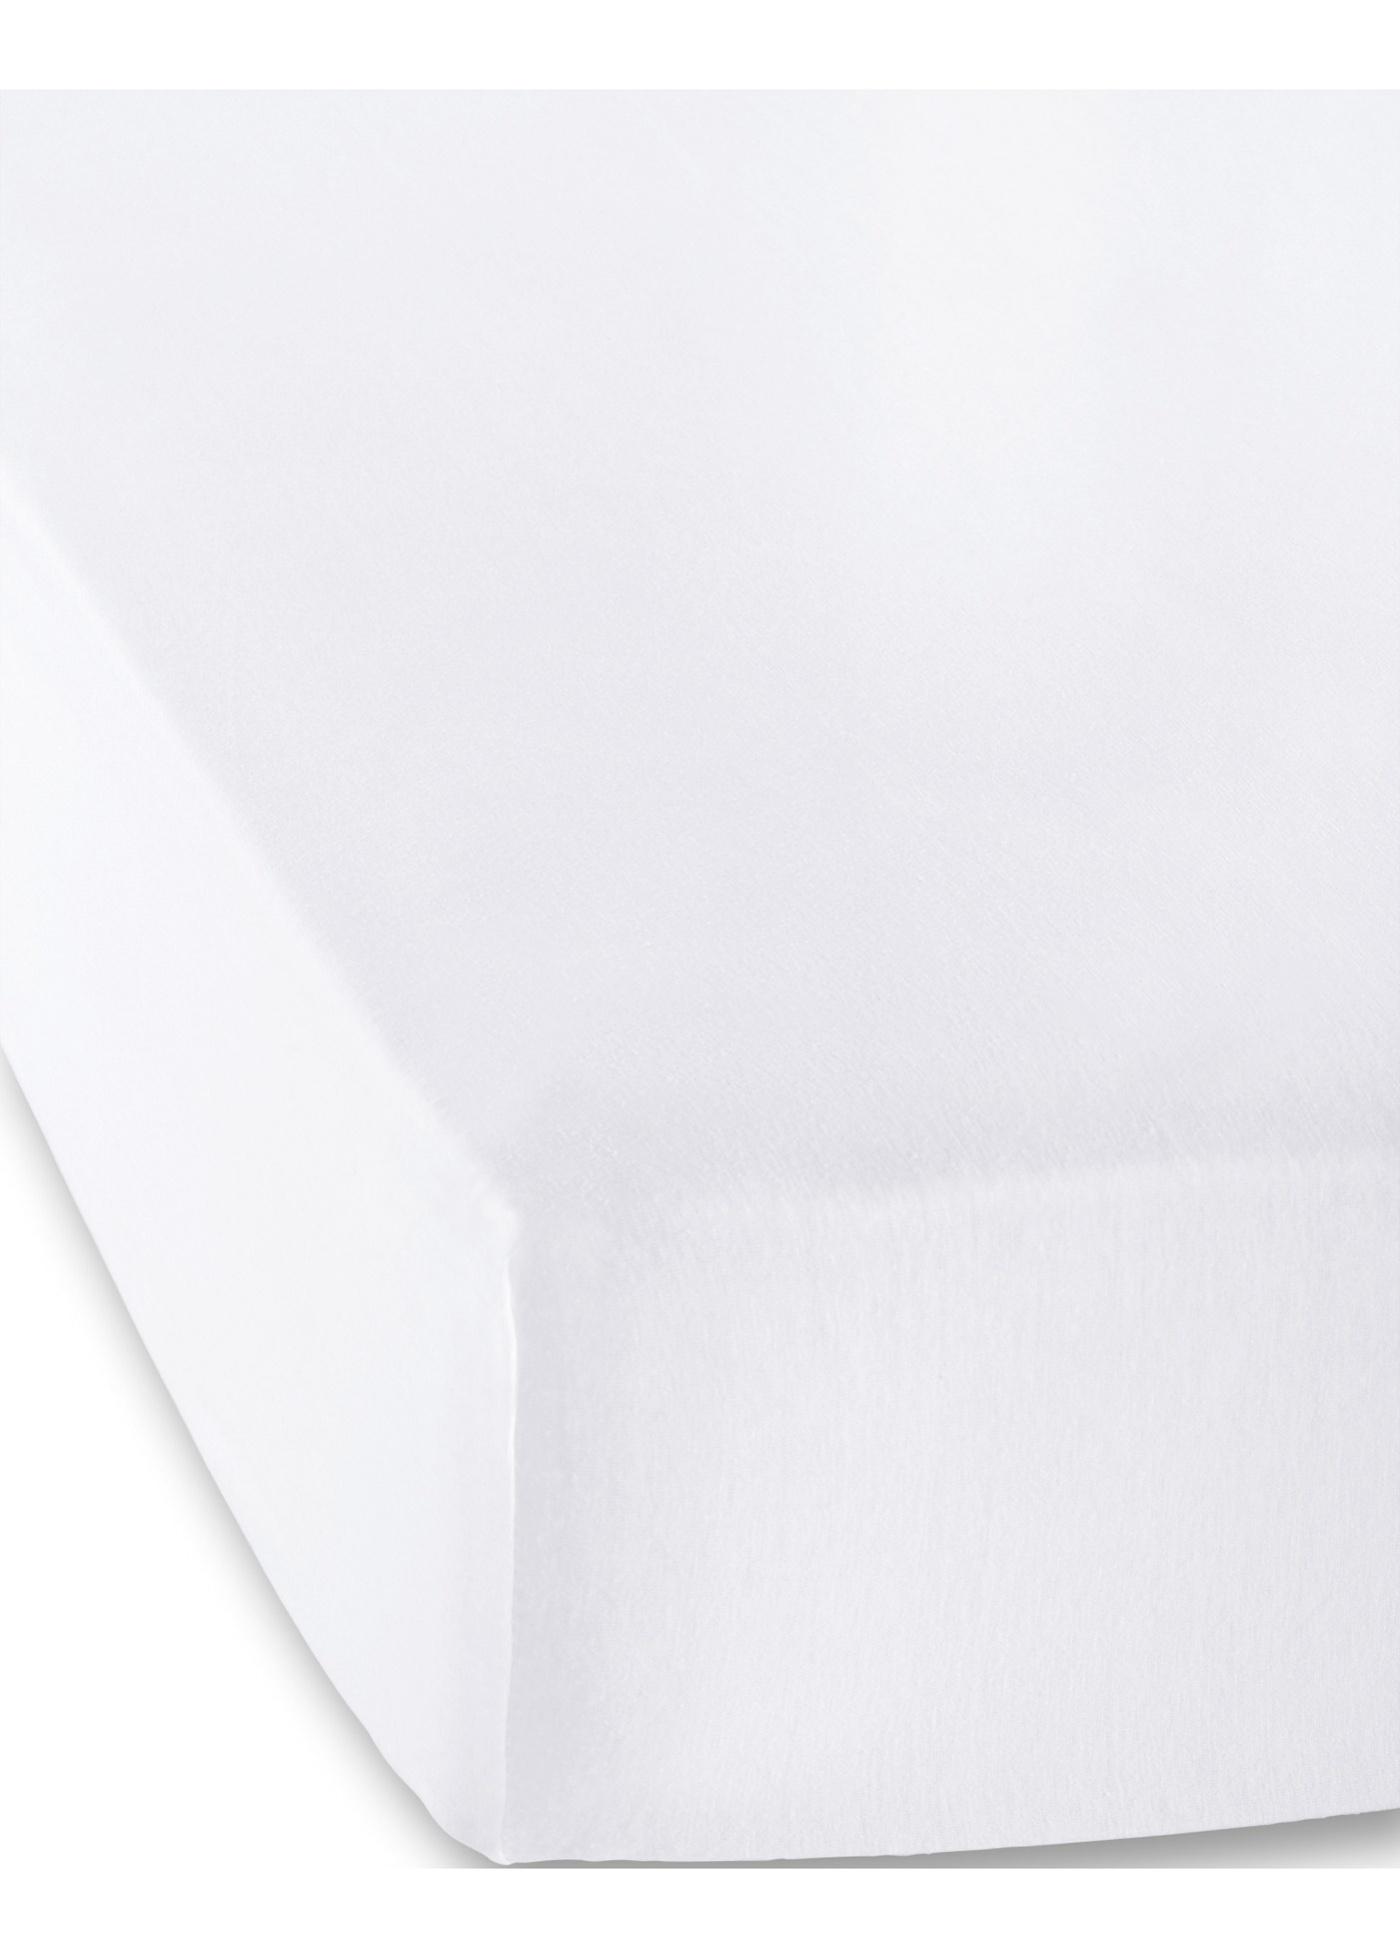 Jersey-stretchlaken 40cm